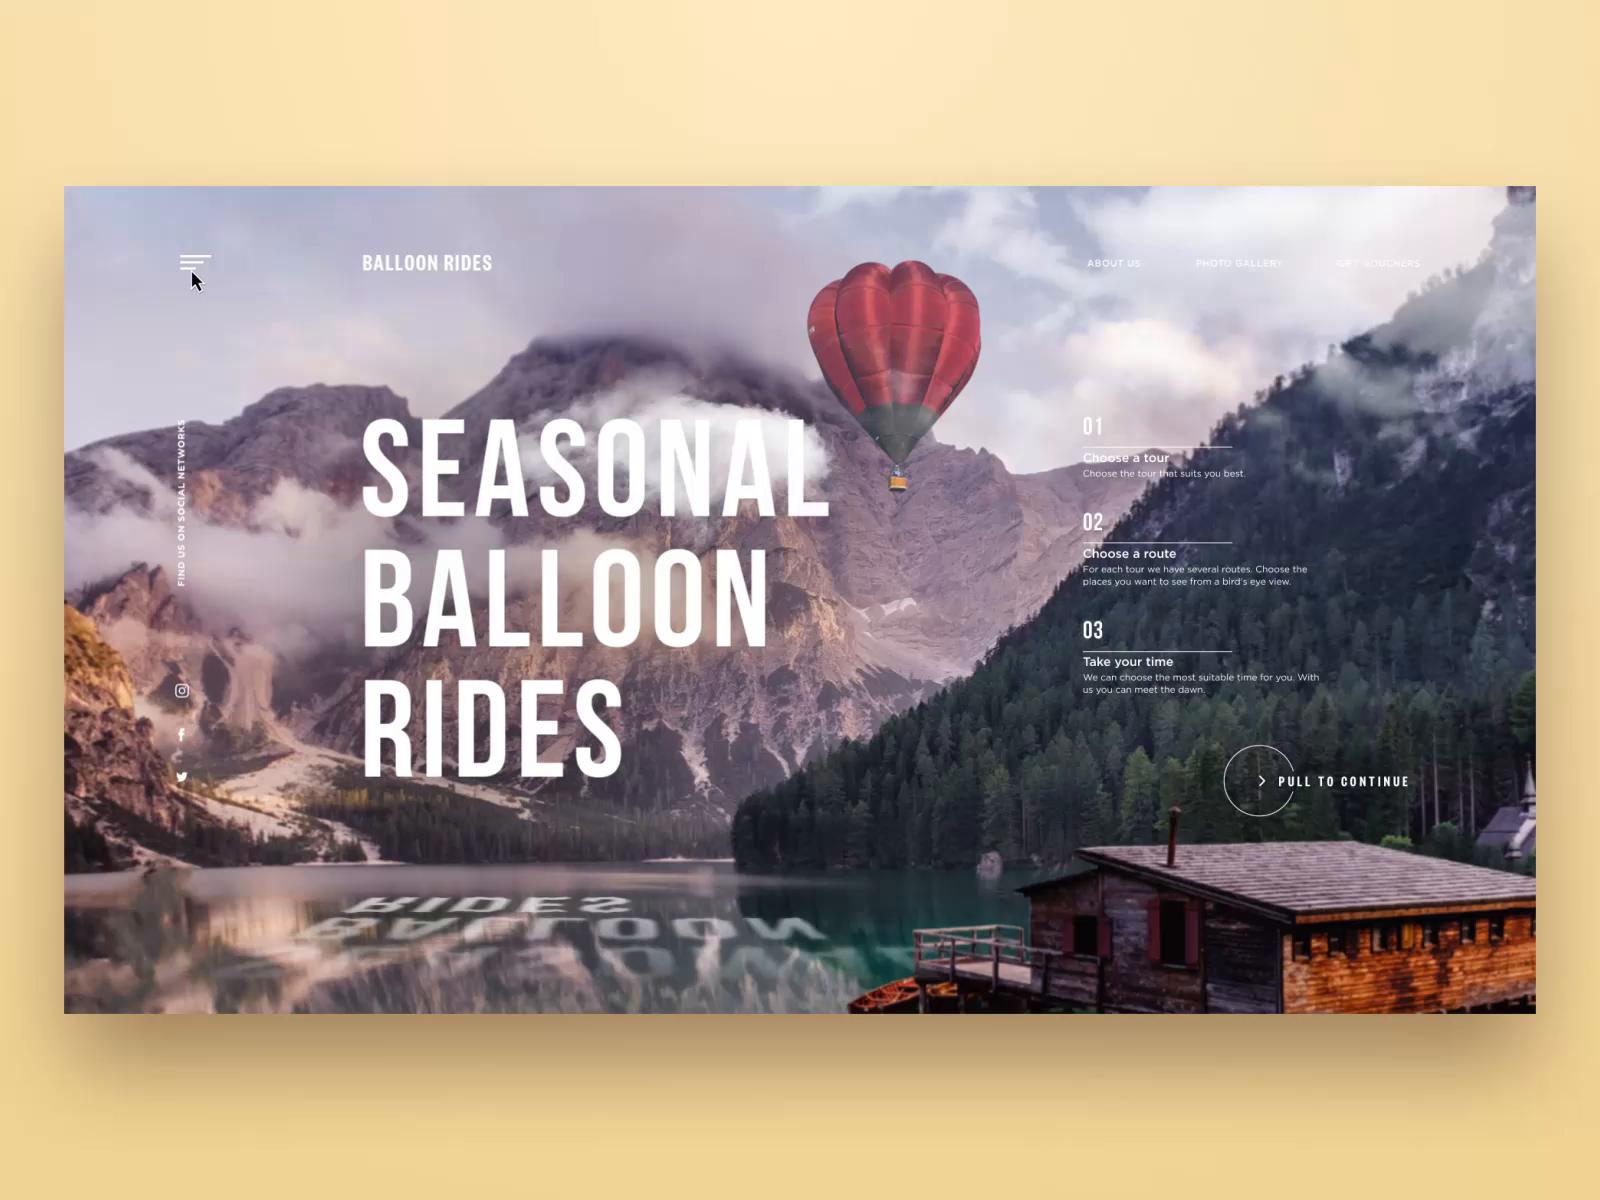 Balloon rides website design tubik